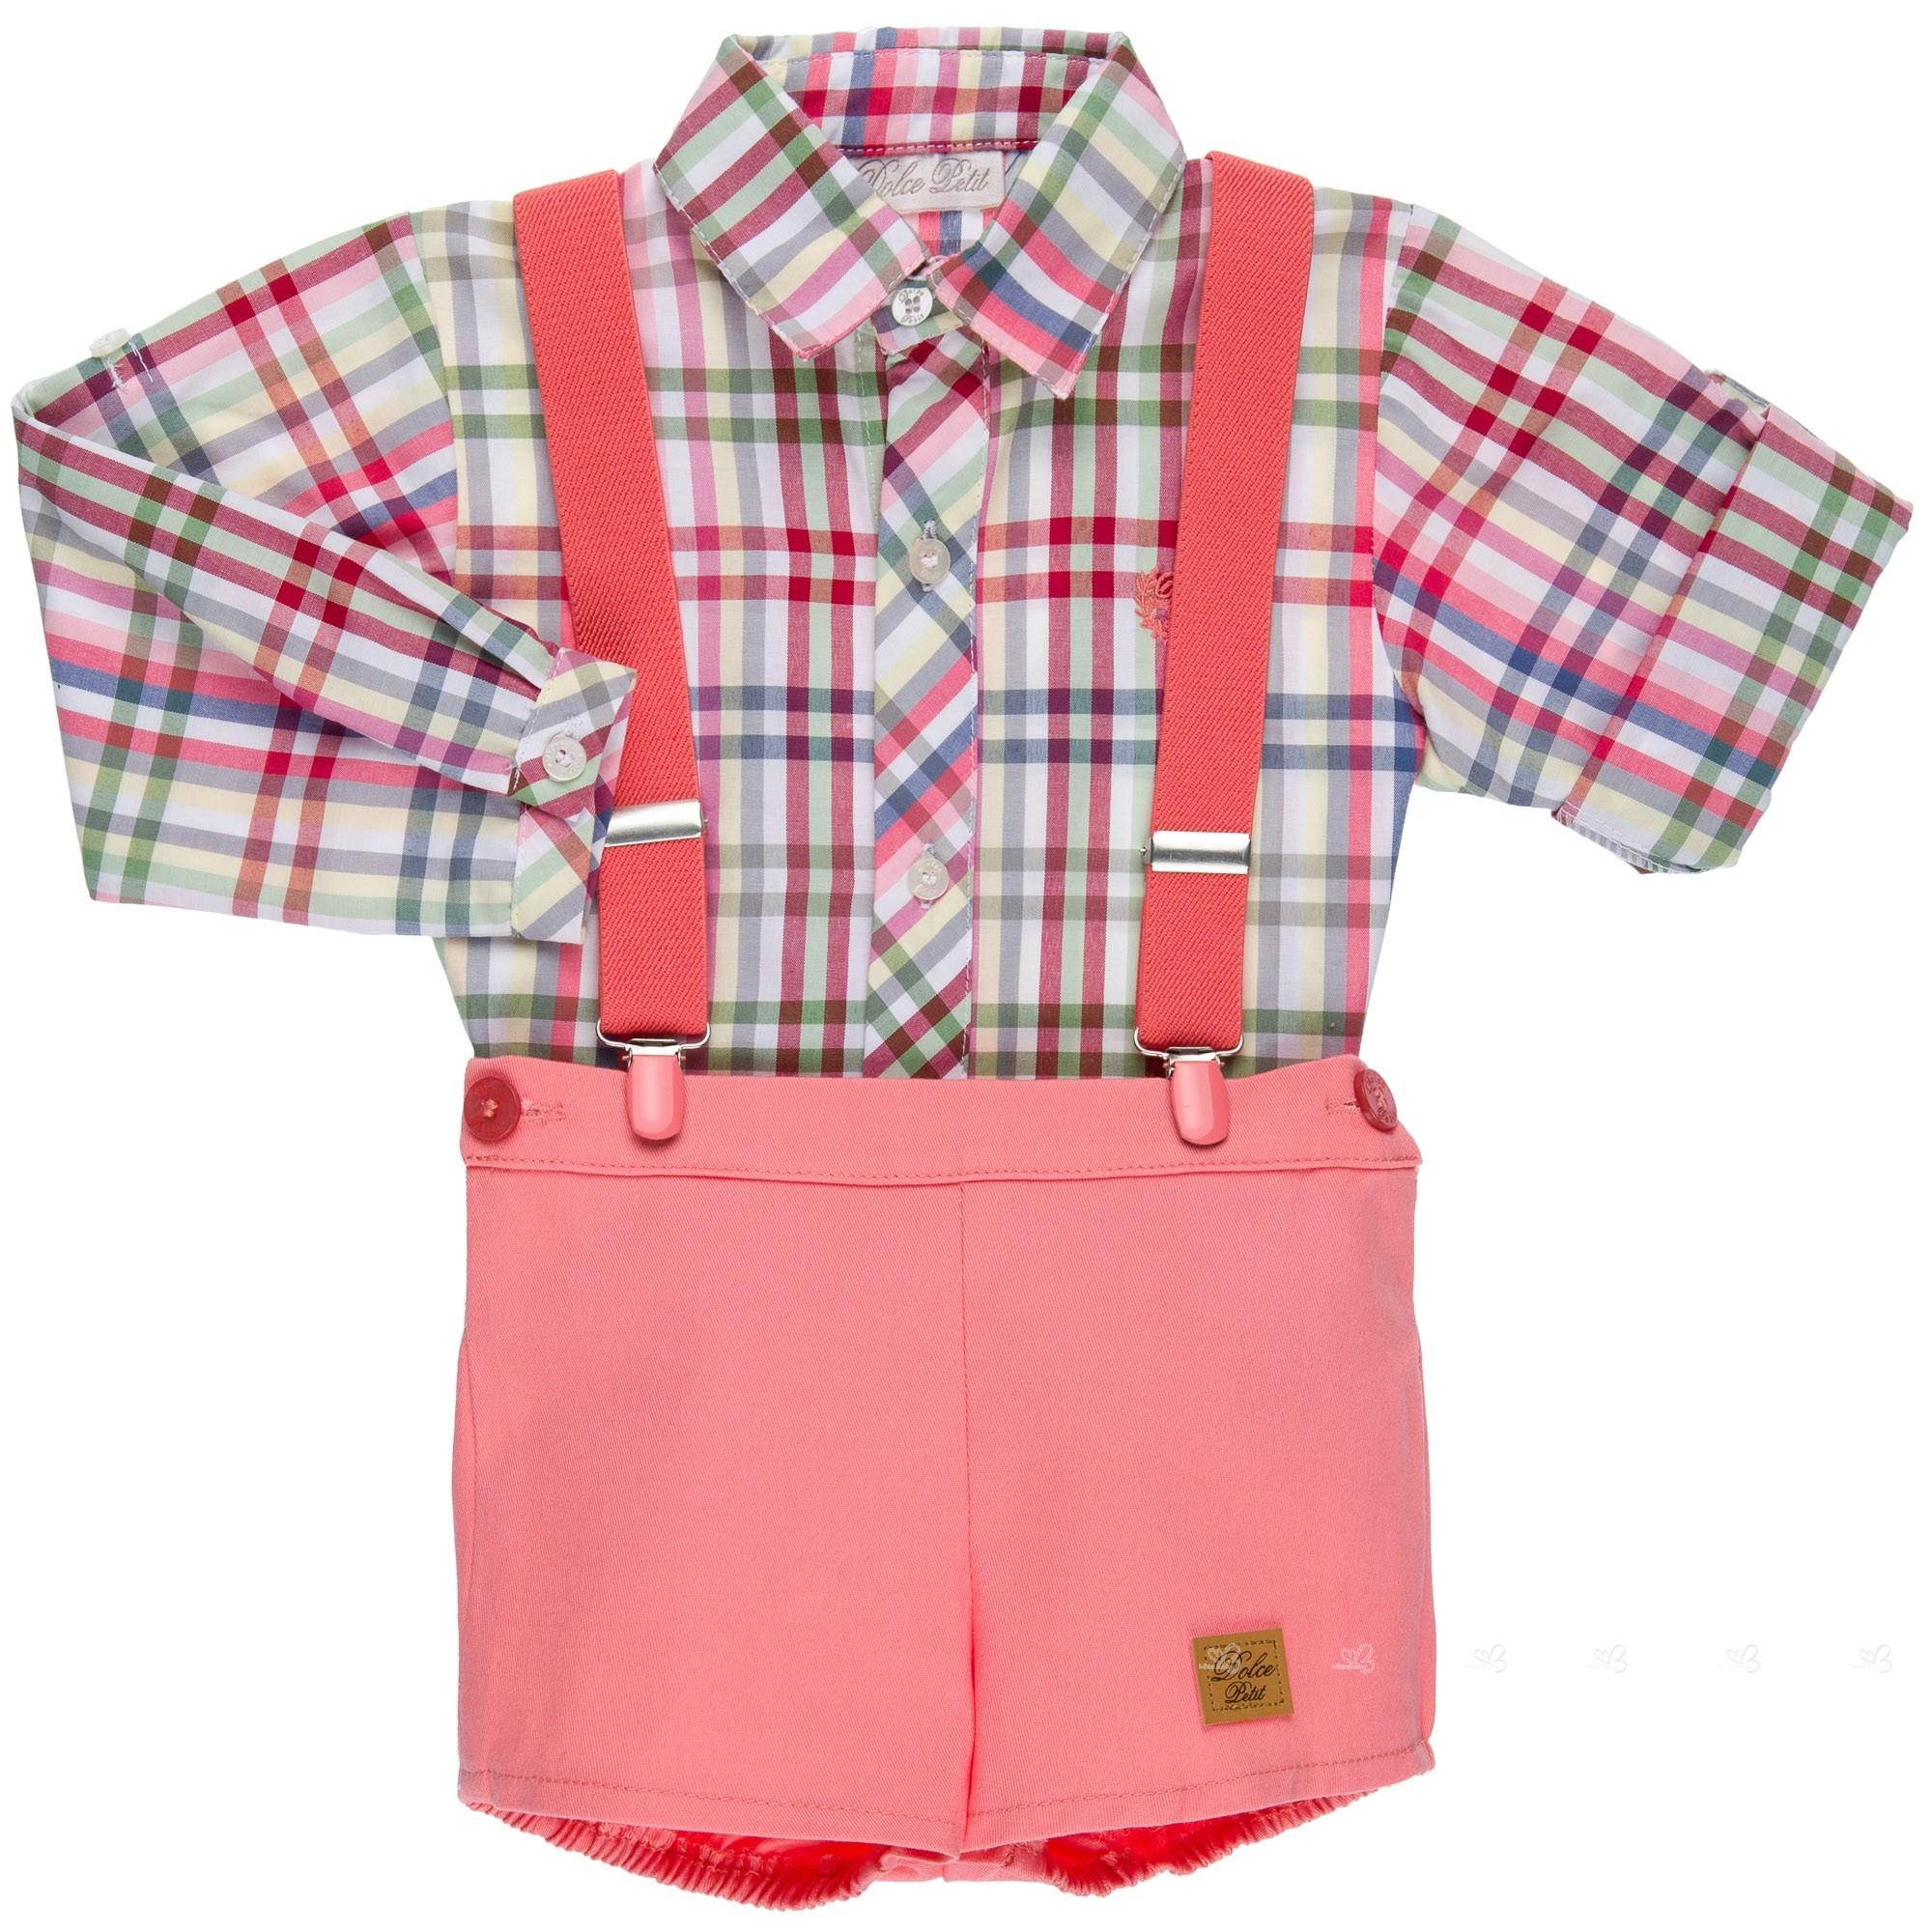 ce794c612 Home; Baby Boys Checked Shirt & Coral Pink 3 Piece Shorts Set. Conjunto  Bebé Camisa Cuadros & Short Coral ...